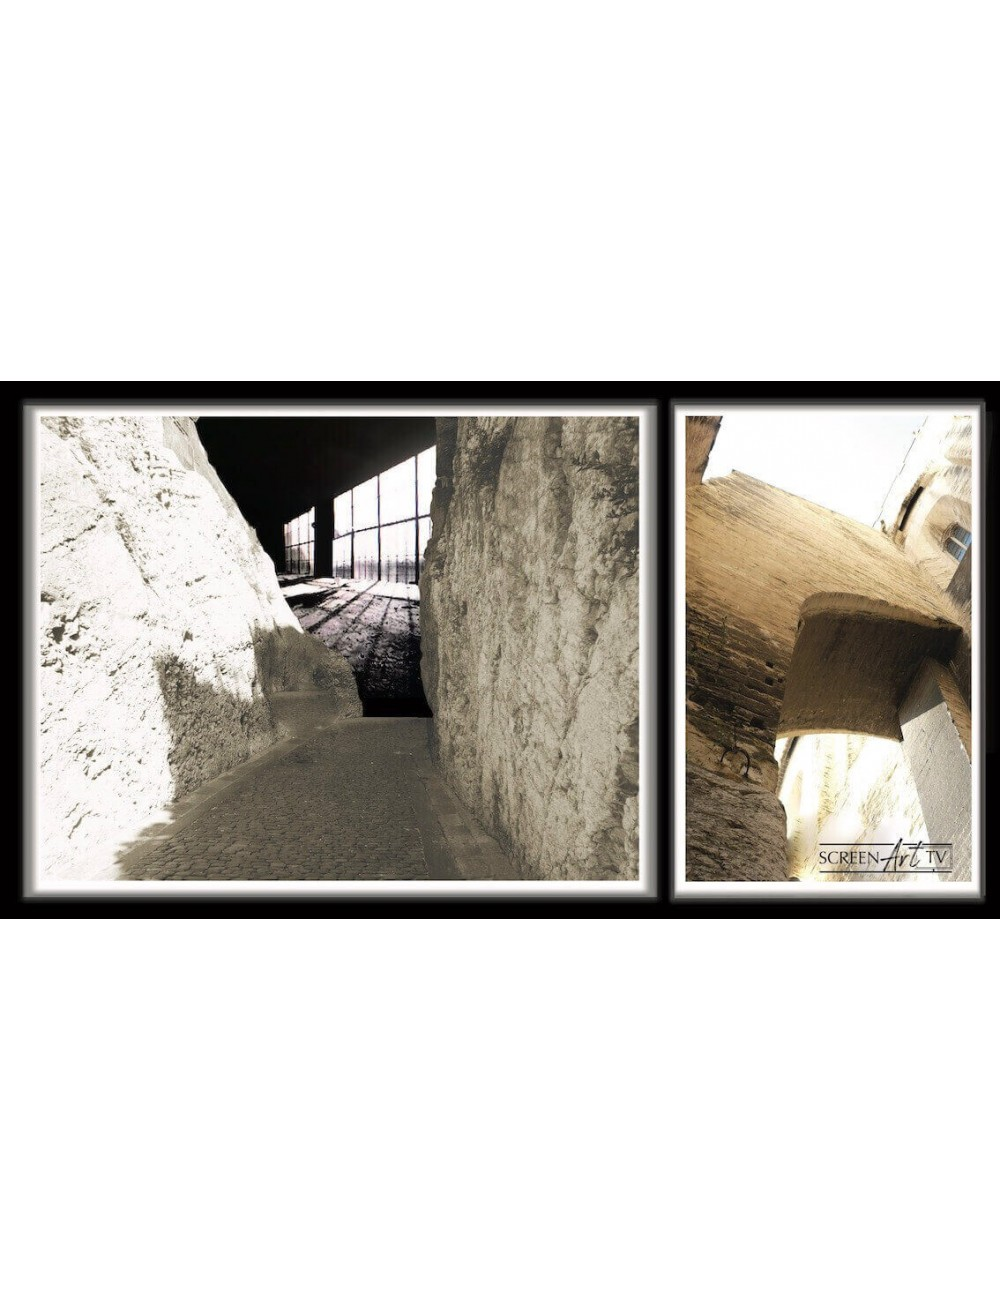 247 2-ARCHITECTURE NATUREL ET OMBRES